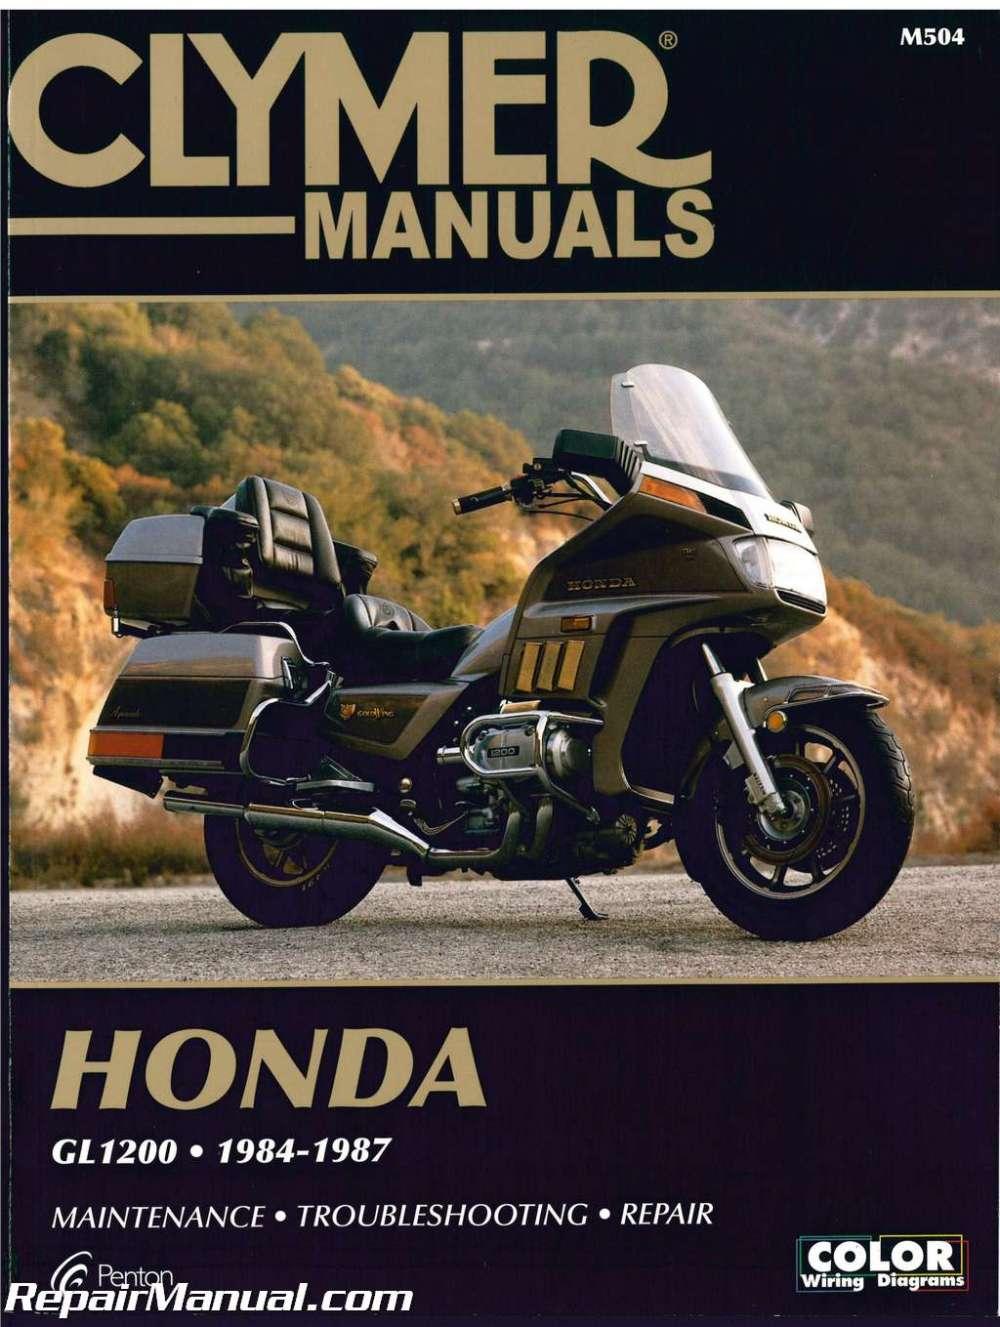 medium resolution of honda gl1200 gold wing motorcycle repair manual 1984 1987 clymer schematic honda goldwing motorcycle 1984 goldwing